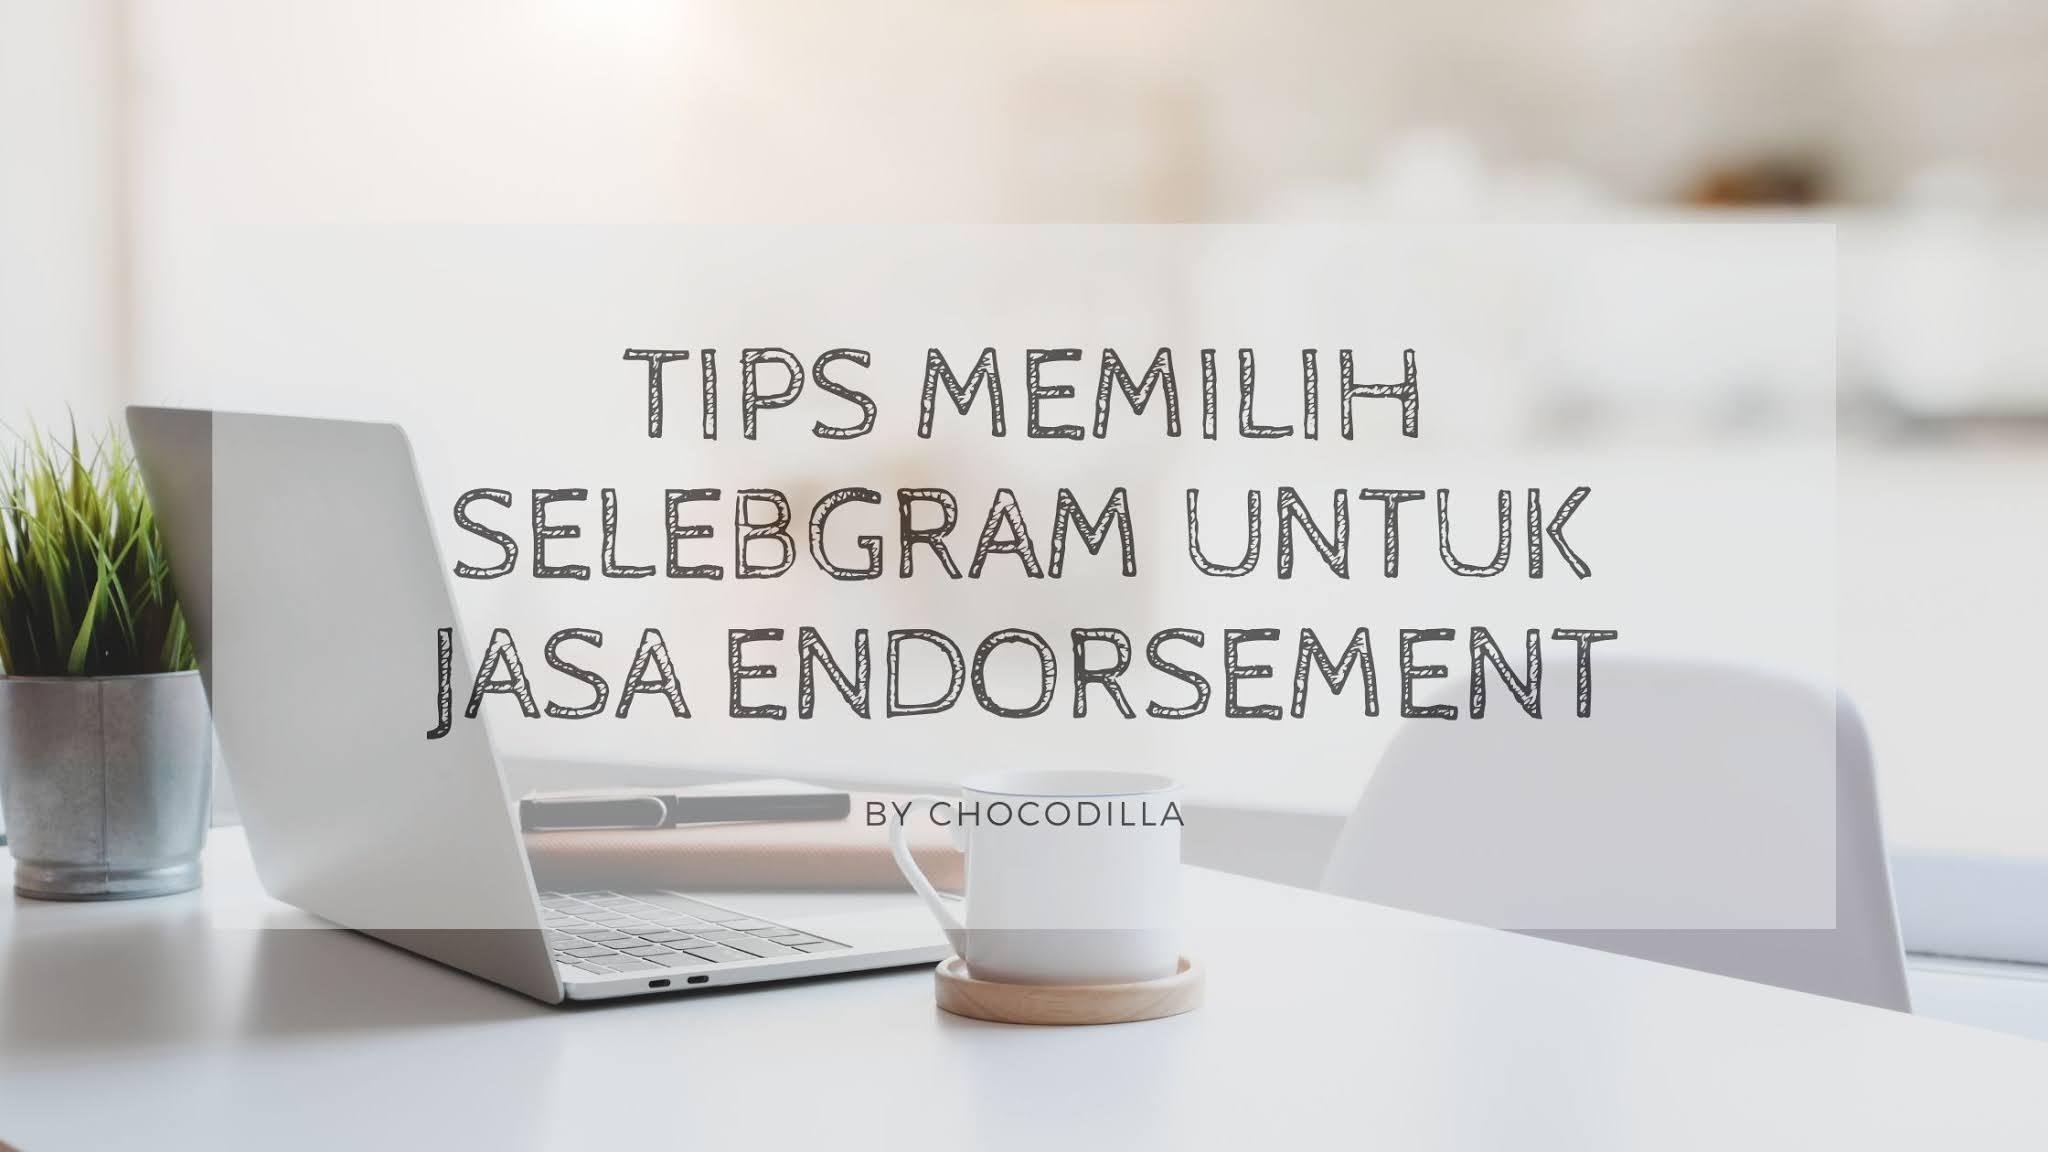 Tips Memilih Selebgram Untuk Jasa Endorsement